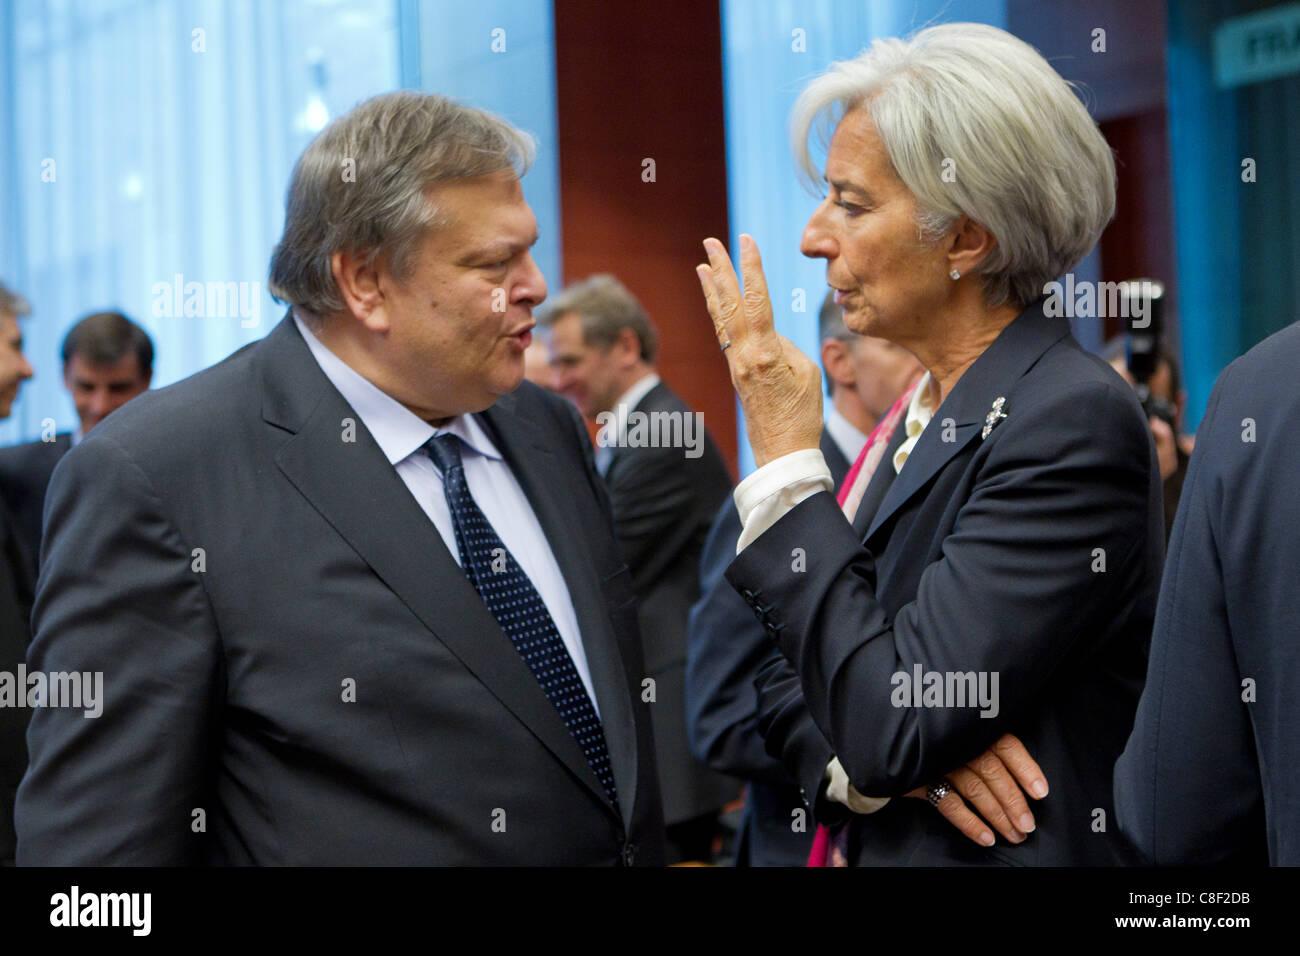 . Greek Finance Minister, Evangelos Venizelos (left) and Christine Lagarde, Director General of the International - Stock Image